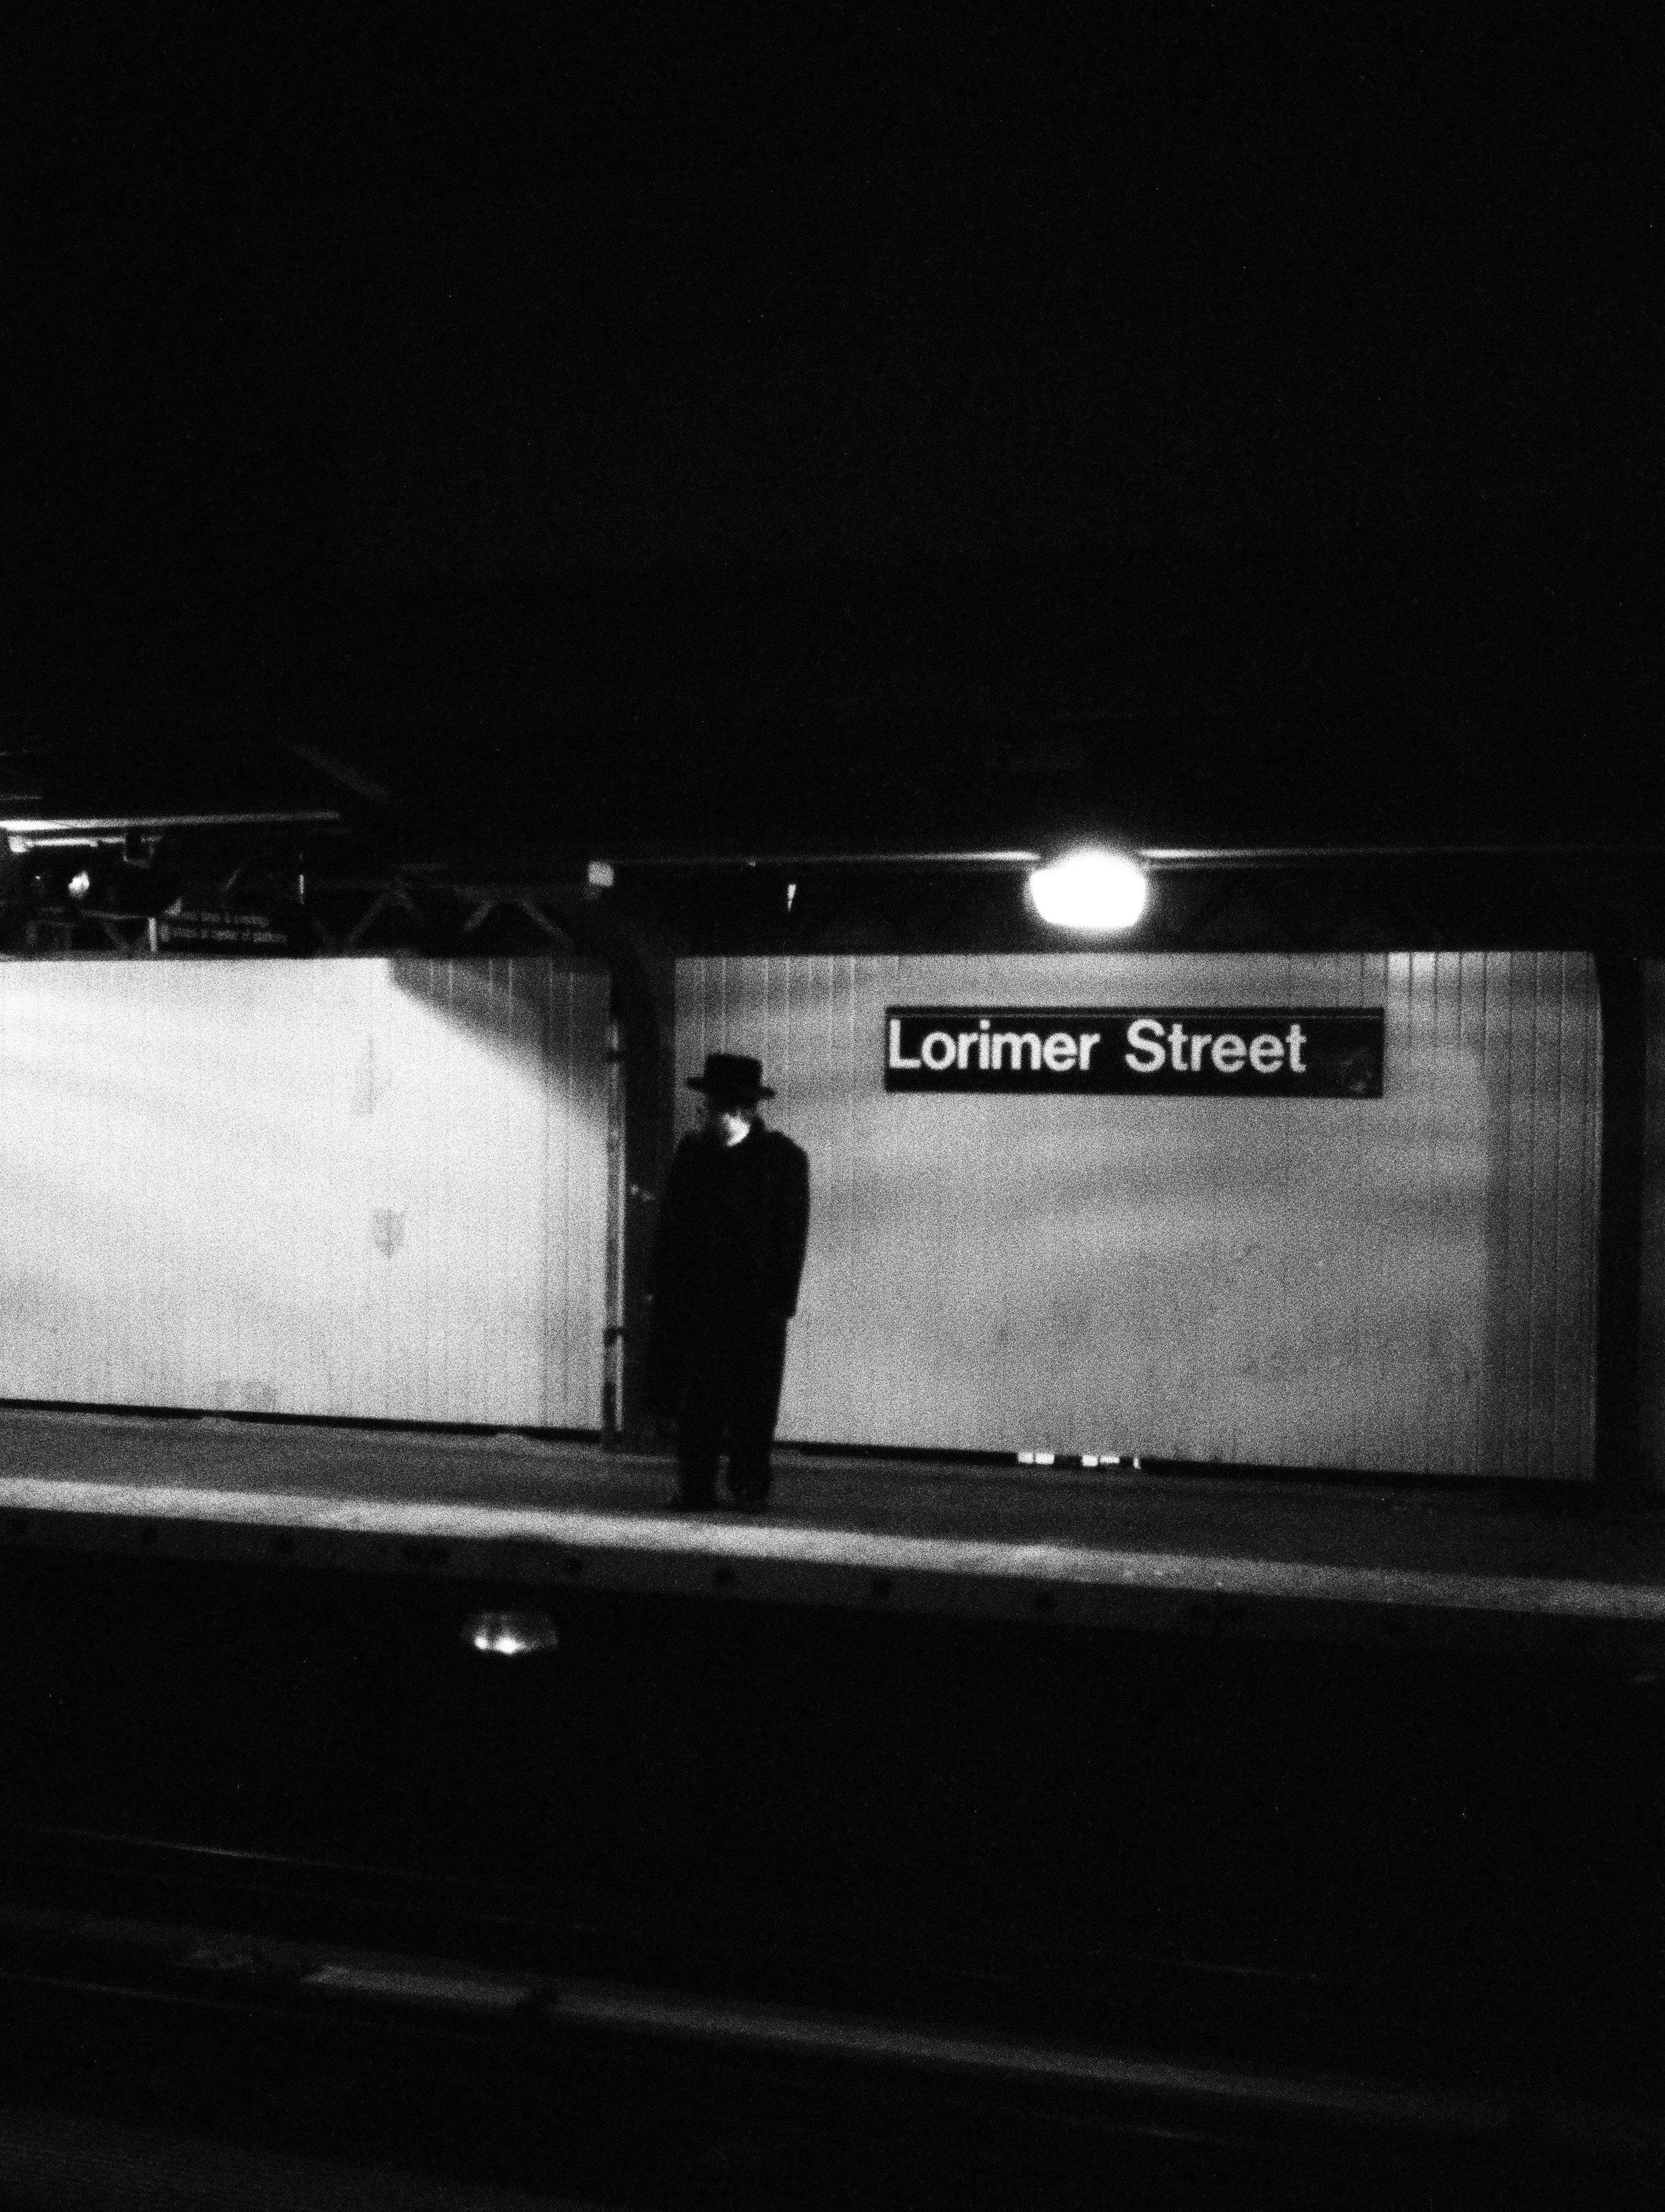 lorimer street.jpg